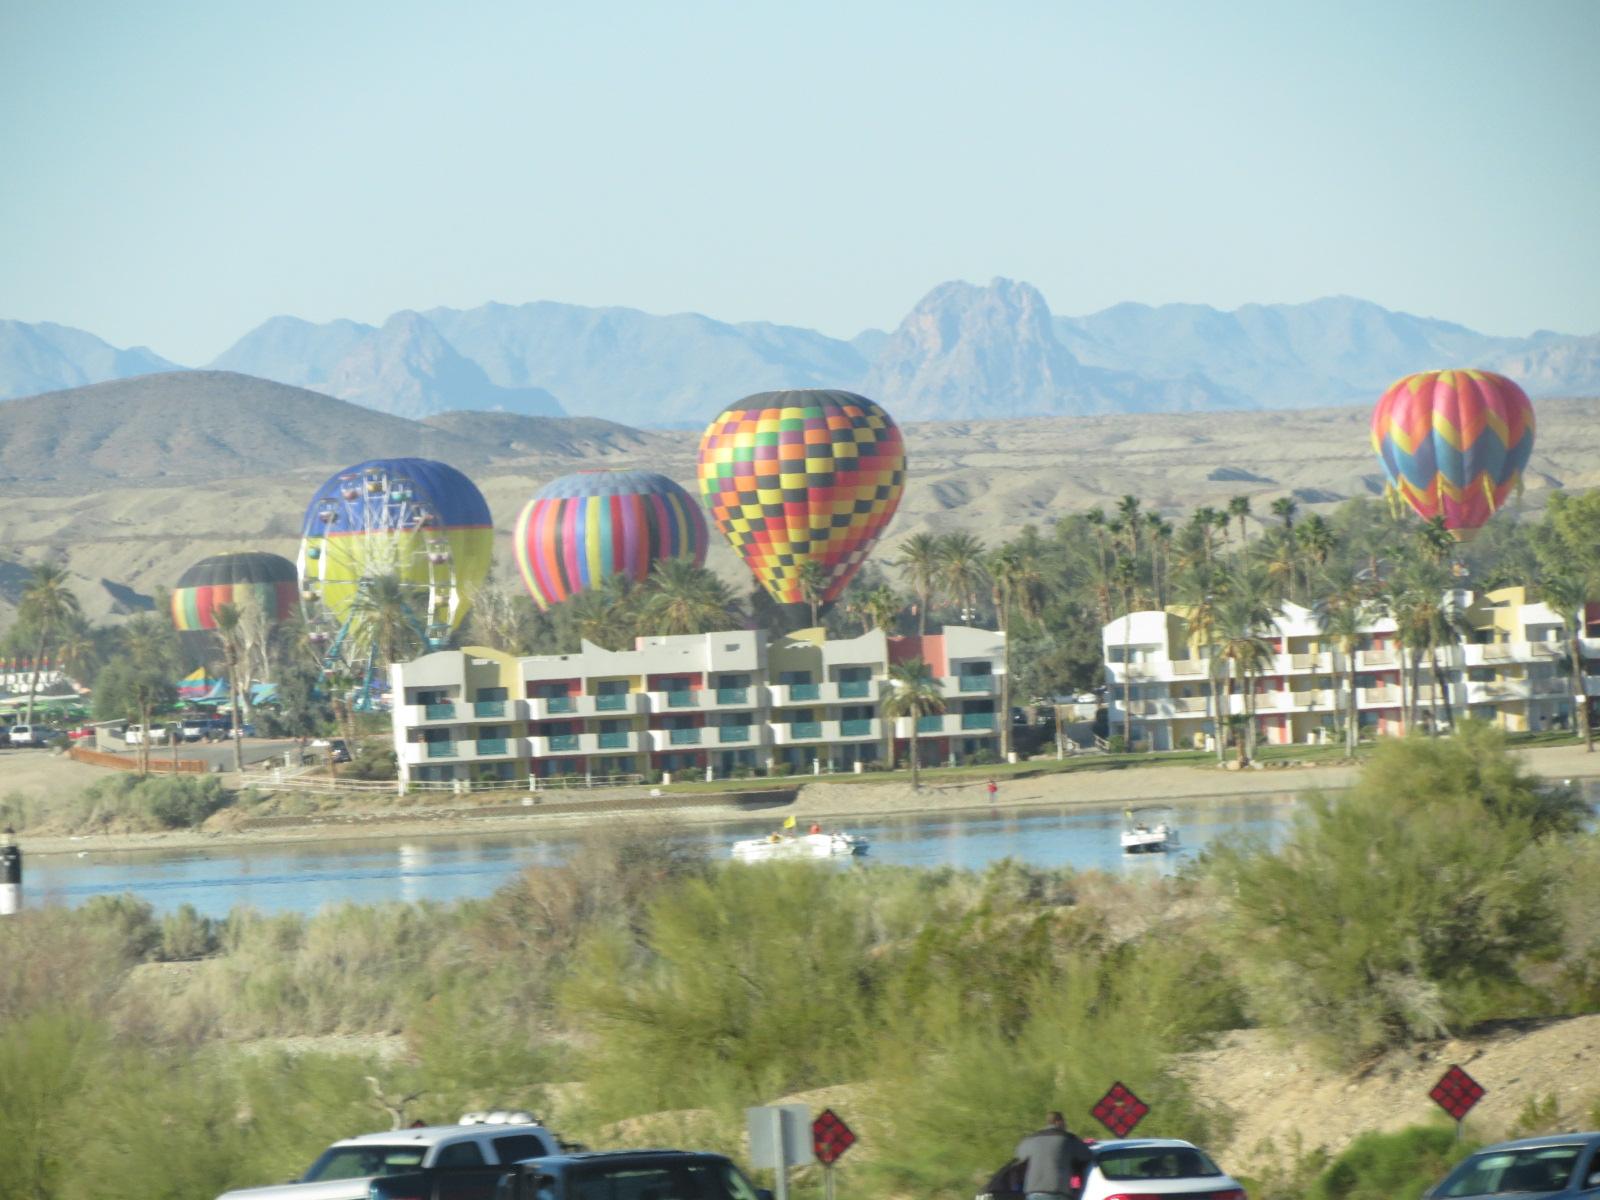 Hot Air Balloons landing after their morning flight.